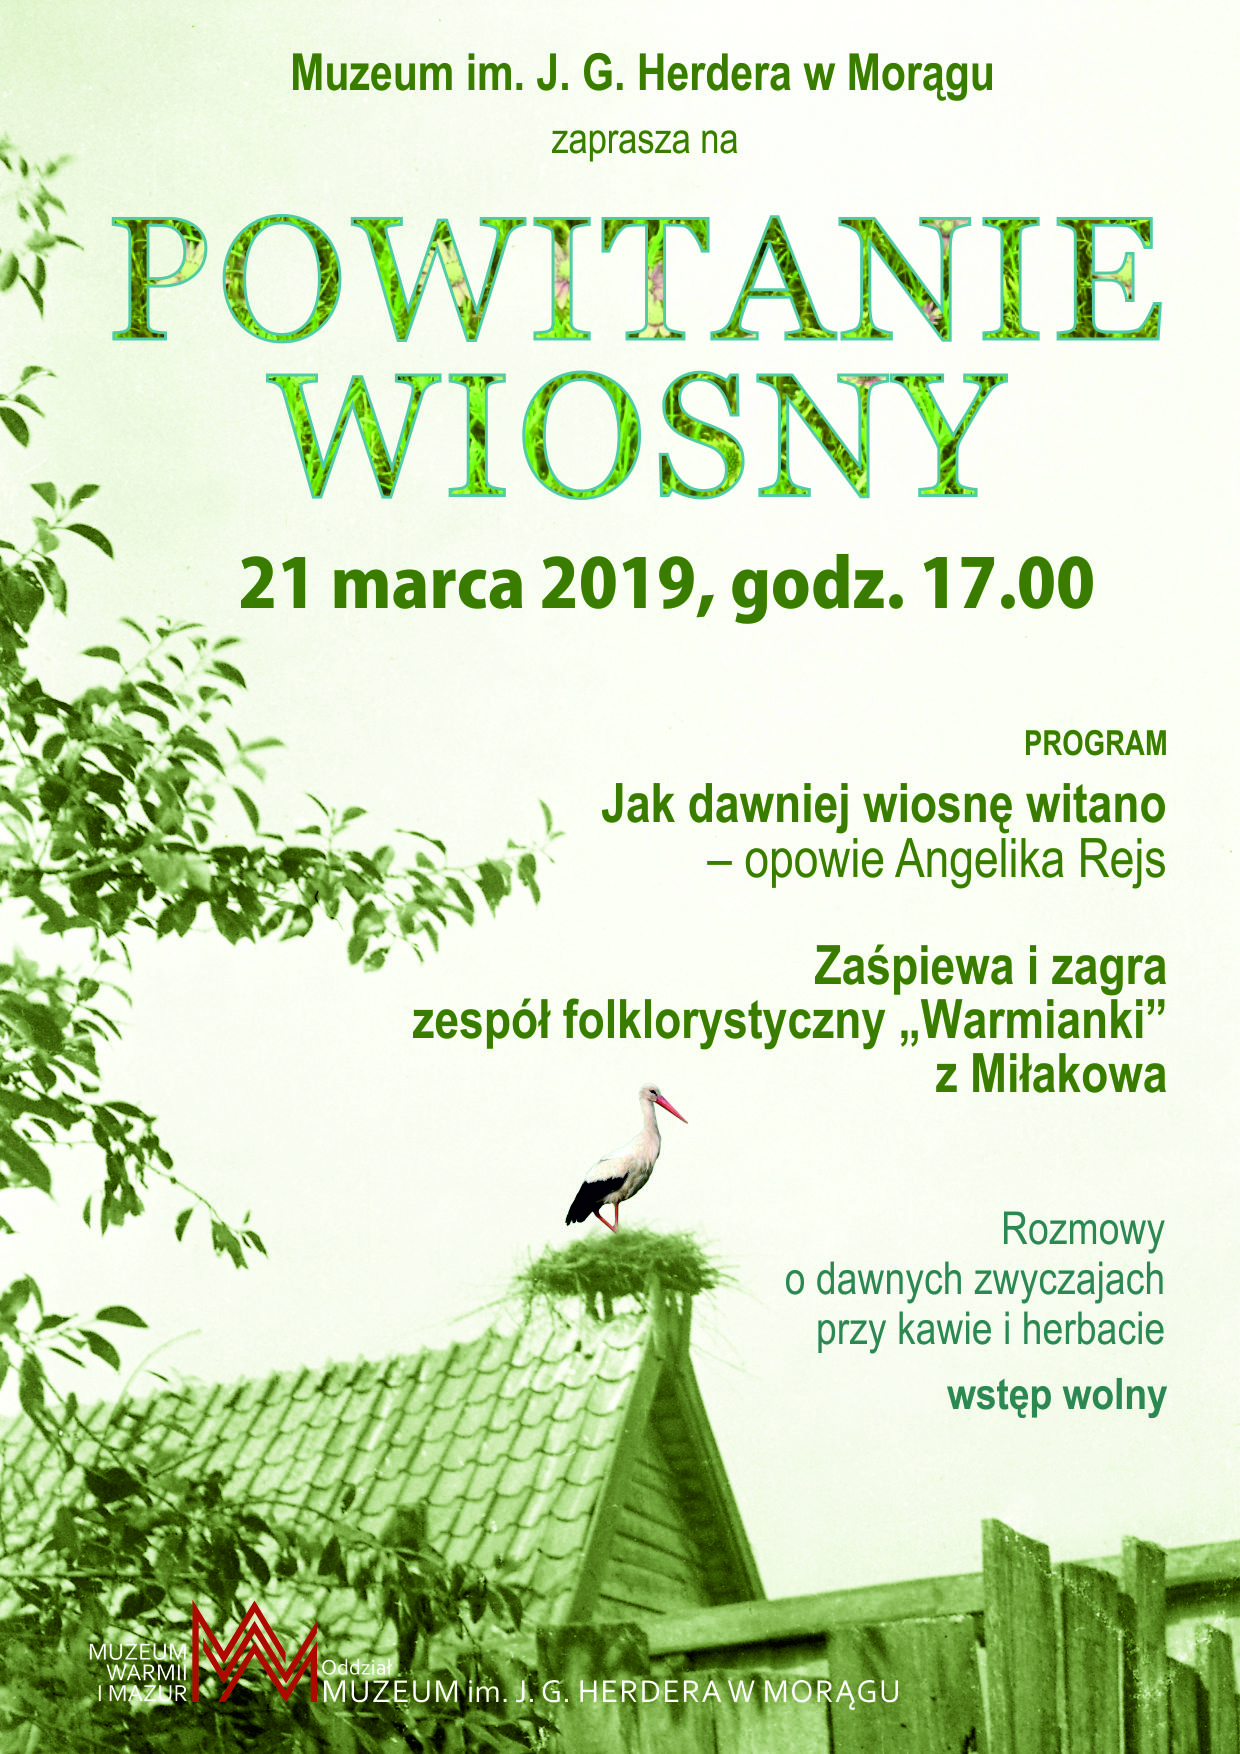 https://m.wmwm.pl/2019/03/orig/wiosna-w-moragu-2019-6344.jpg